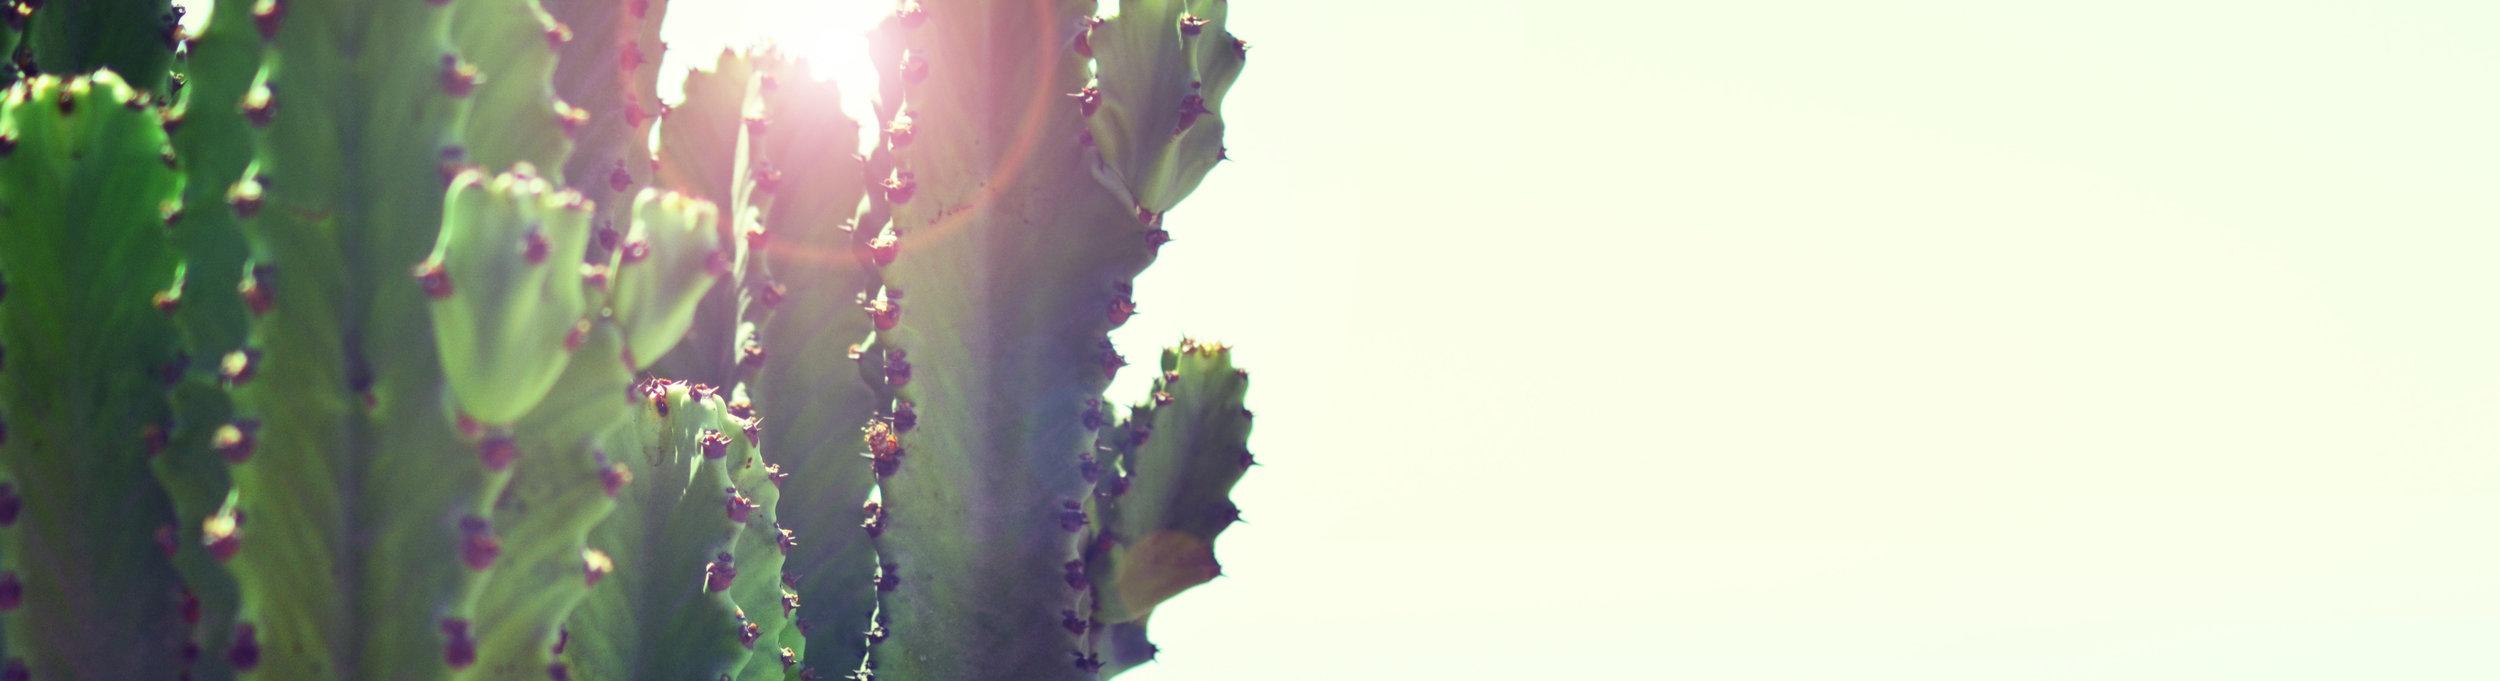 Cactus sunlight_cropped.jpg